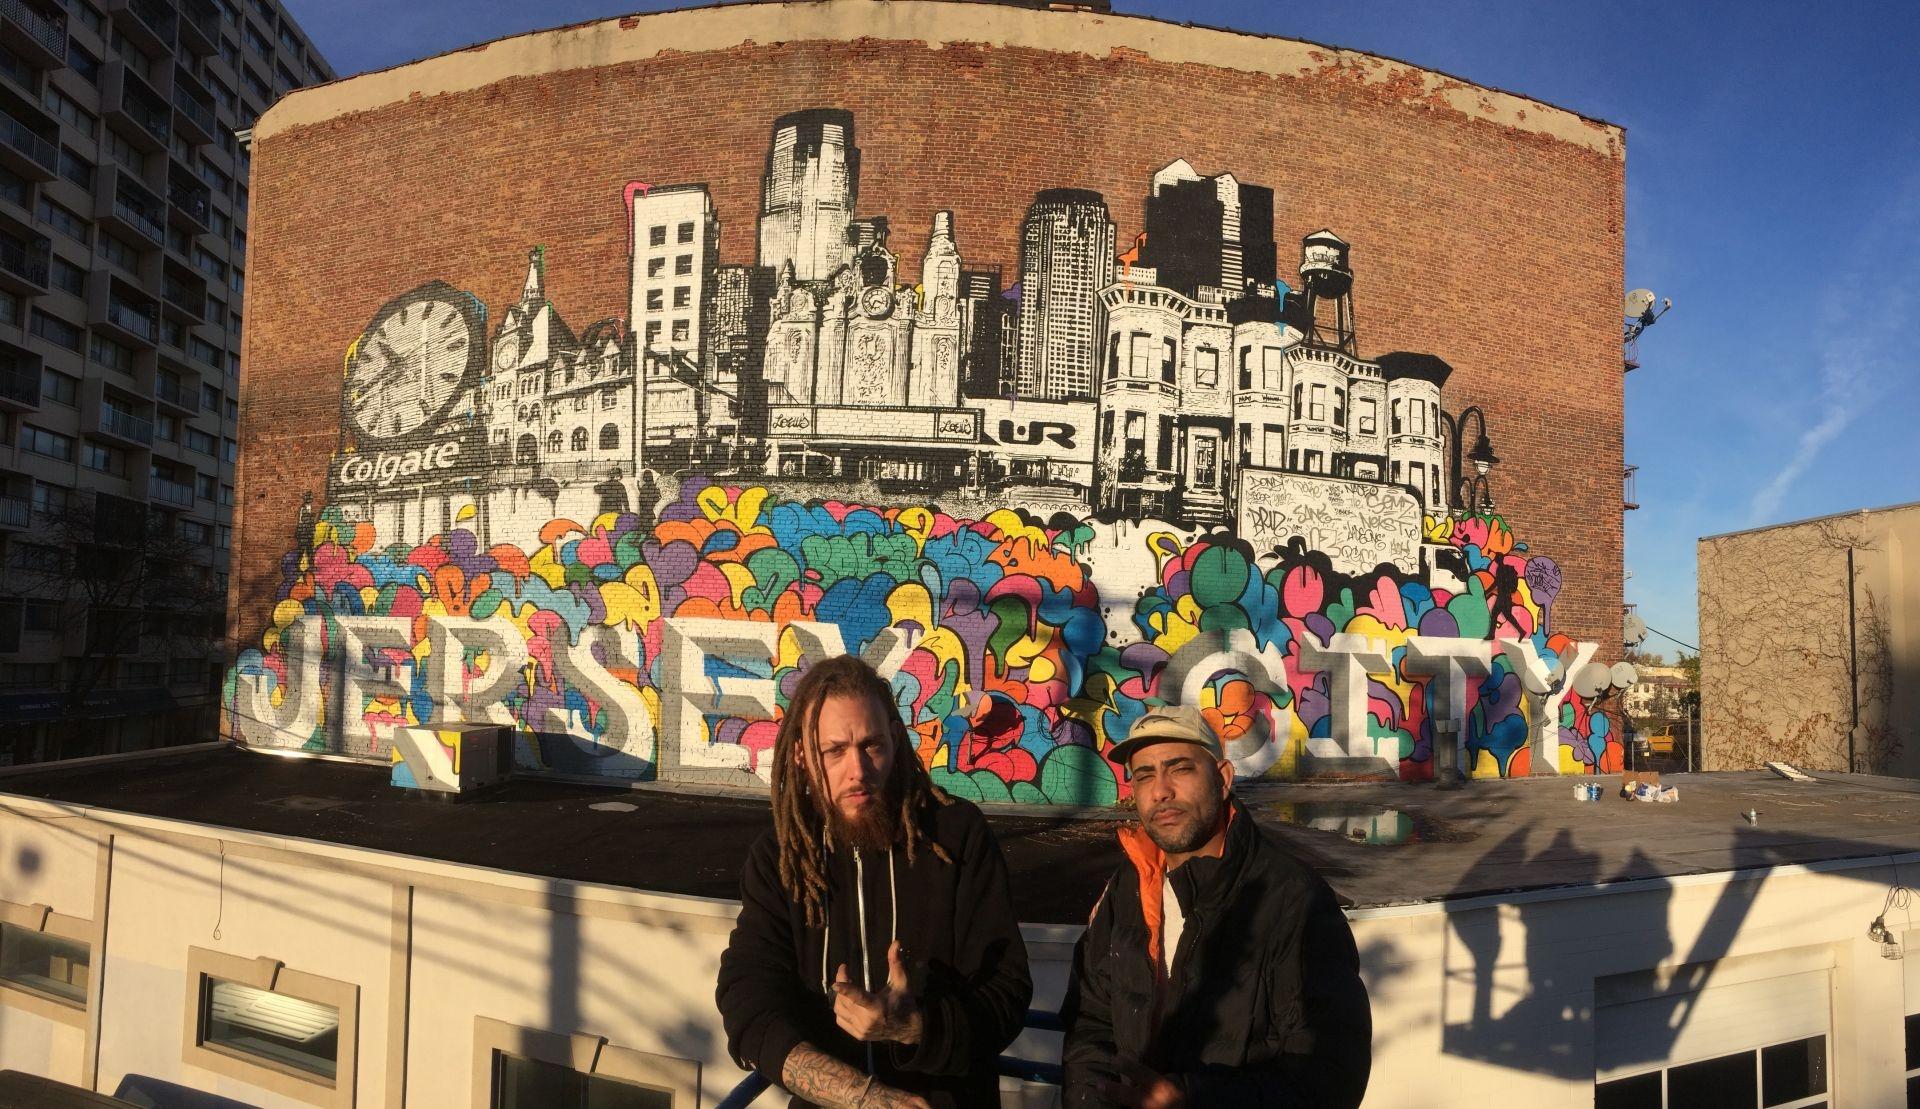 Graffiti art jersey city - Jersey City Mural By Ur New York